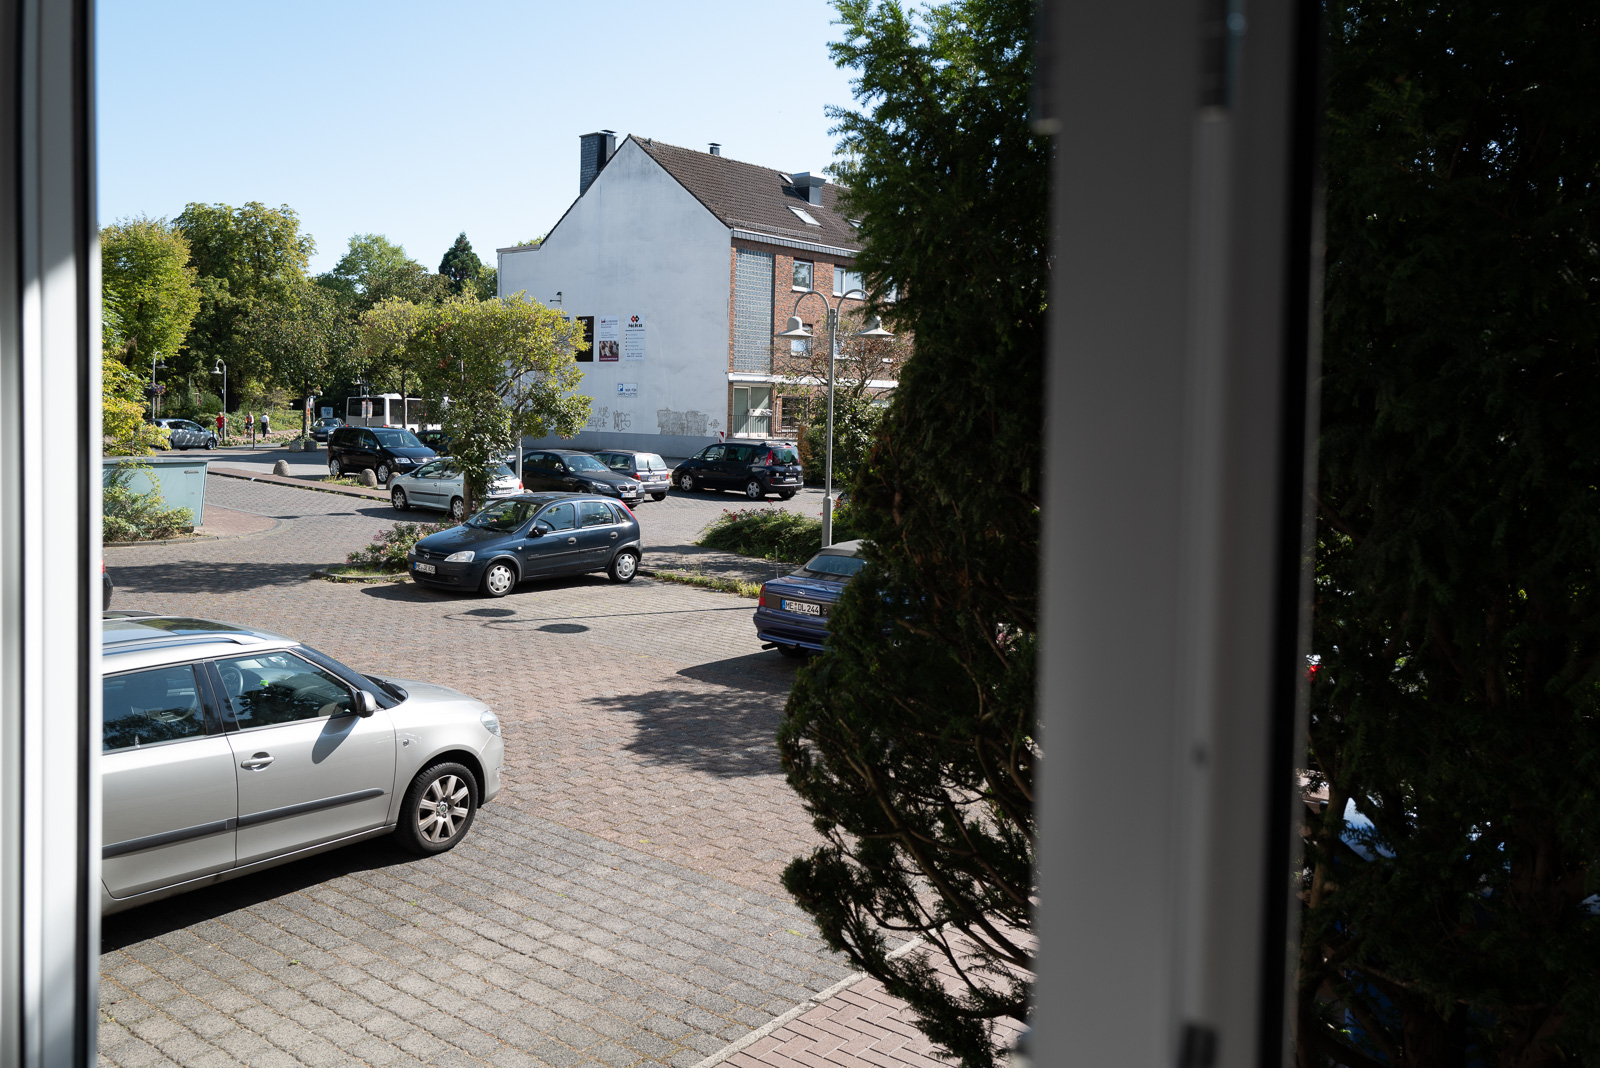 Room 18, Hotel Angerland, Lintorf/Germany